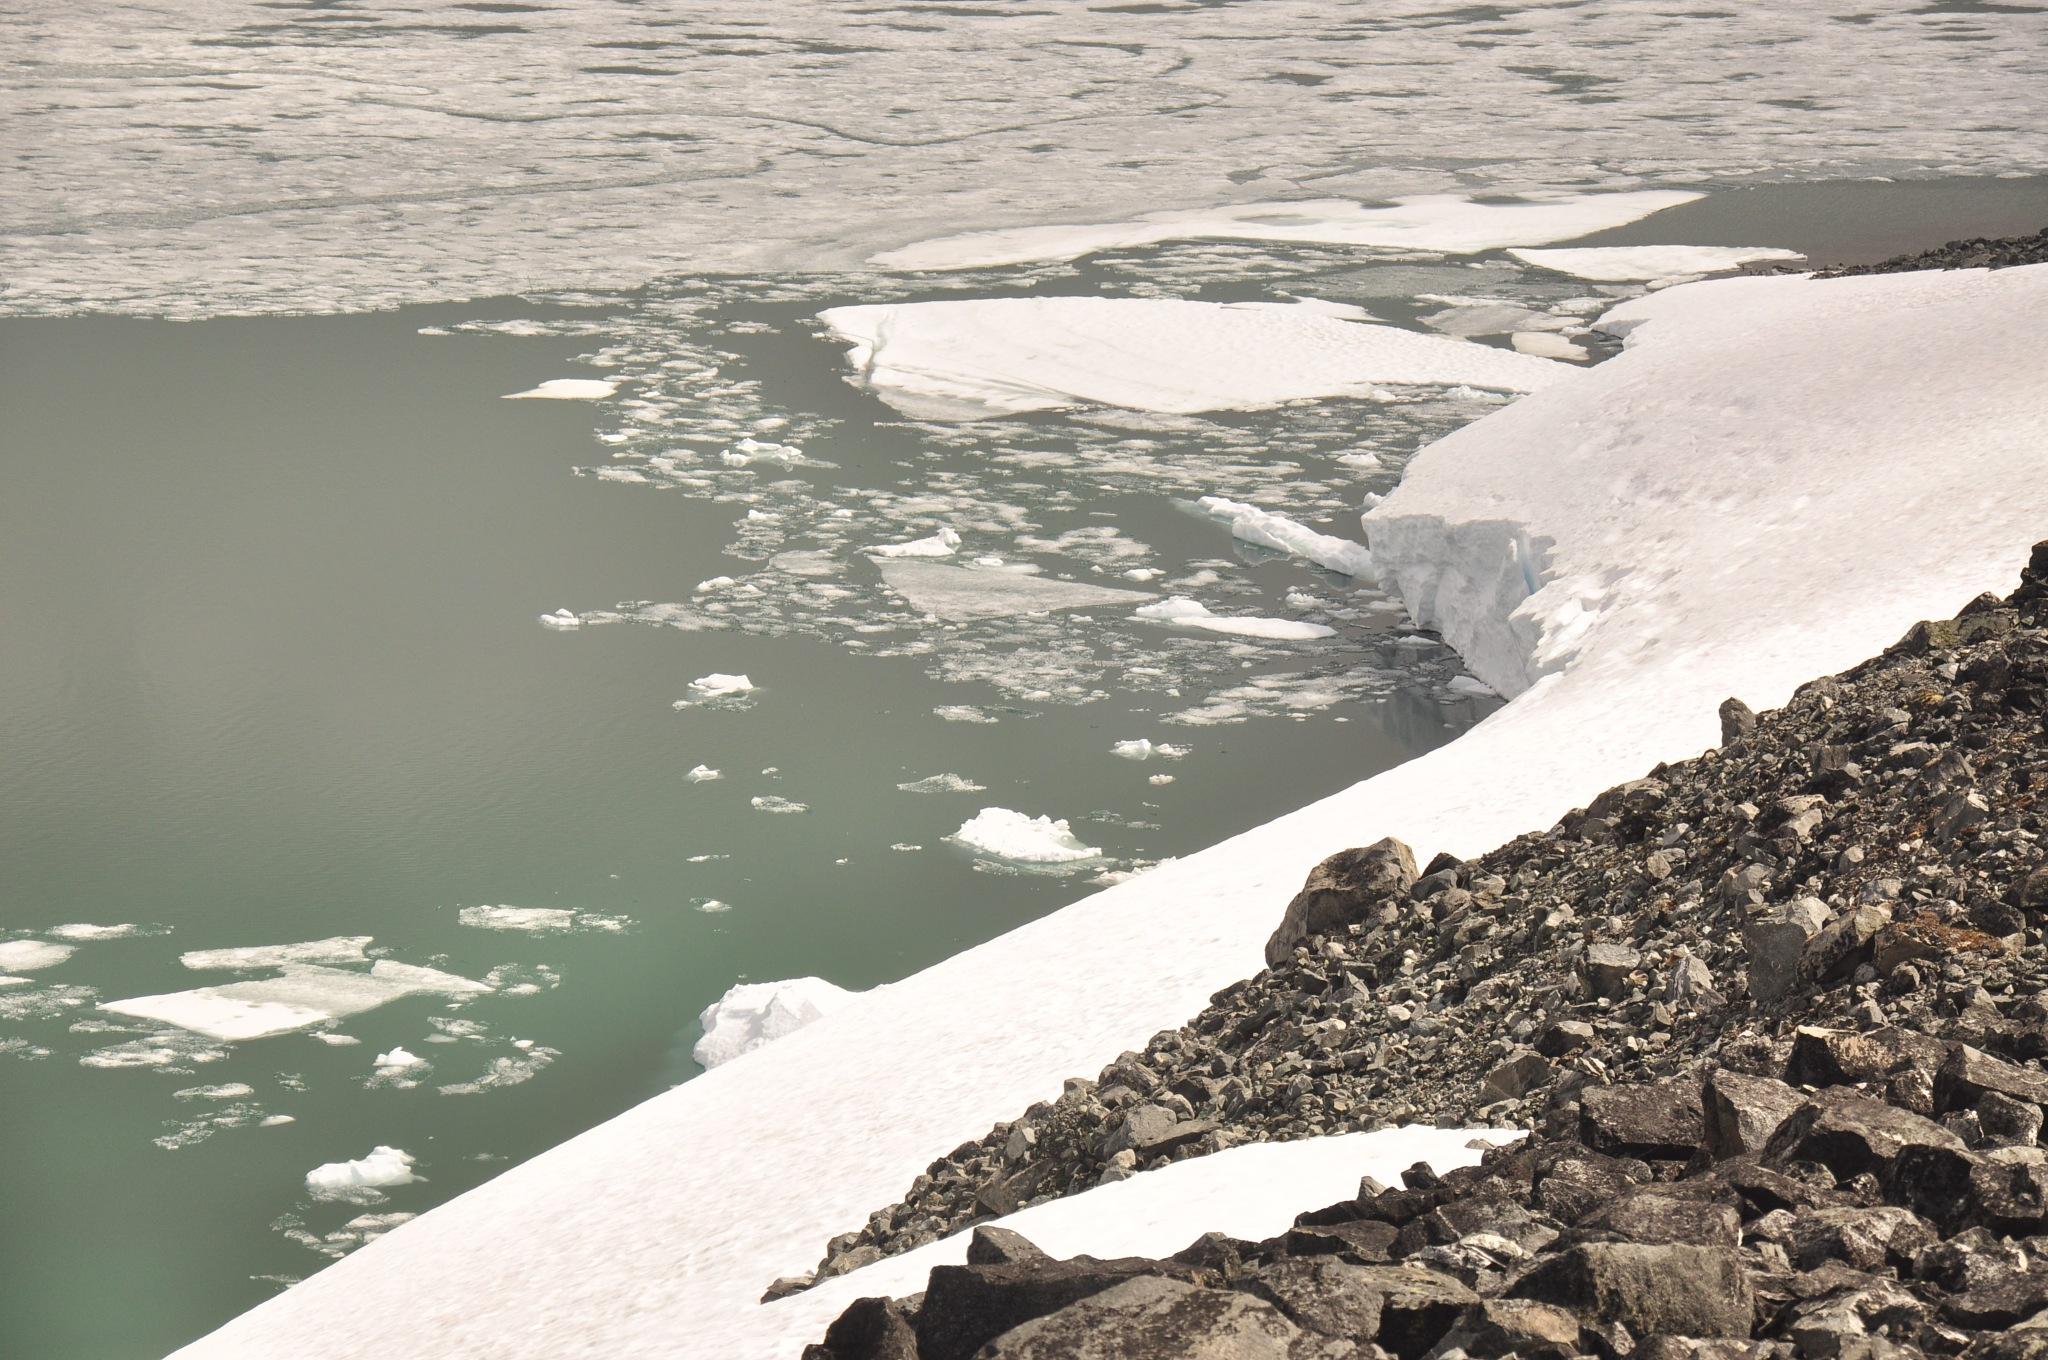 Icecold lake by Dag Olav Øverland